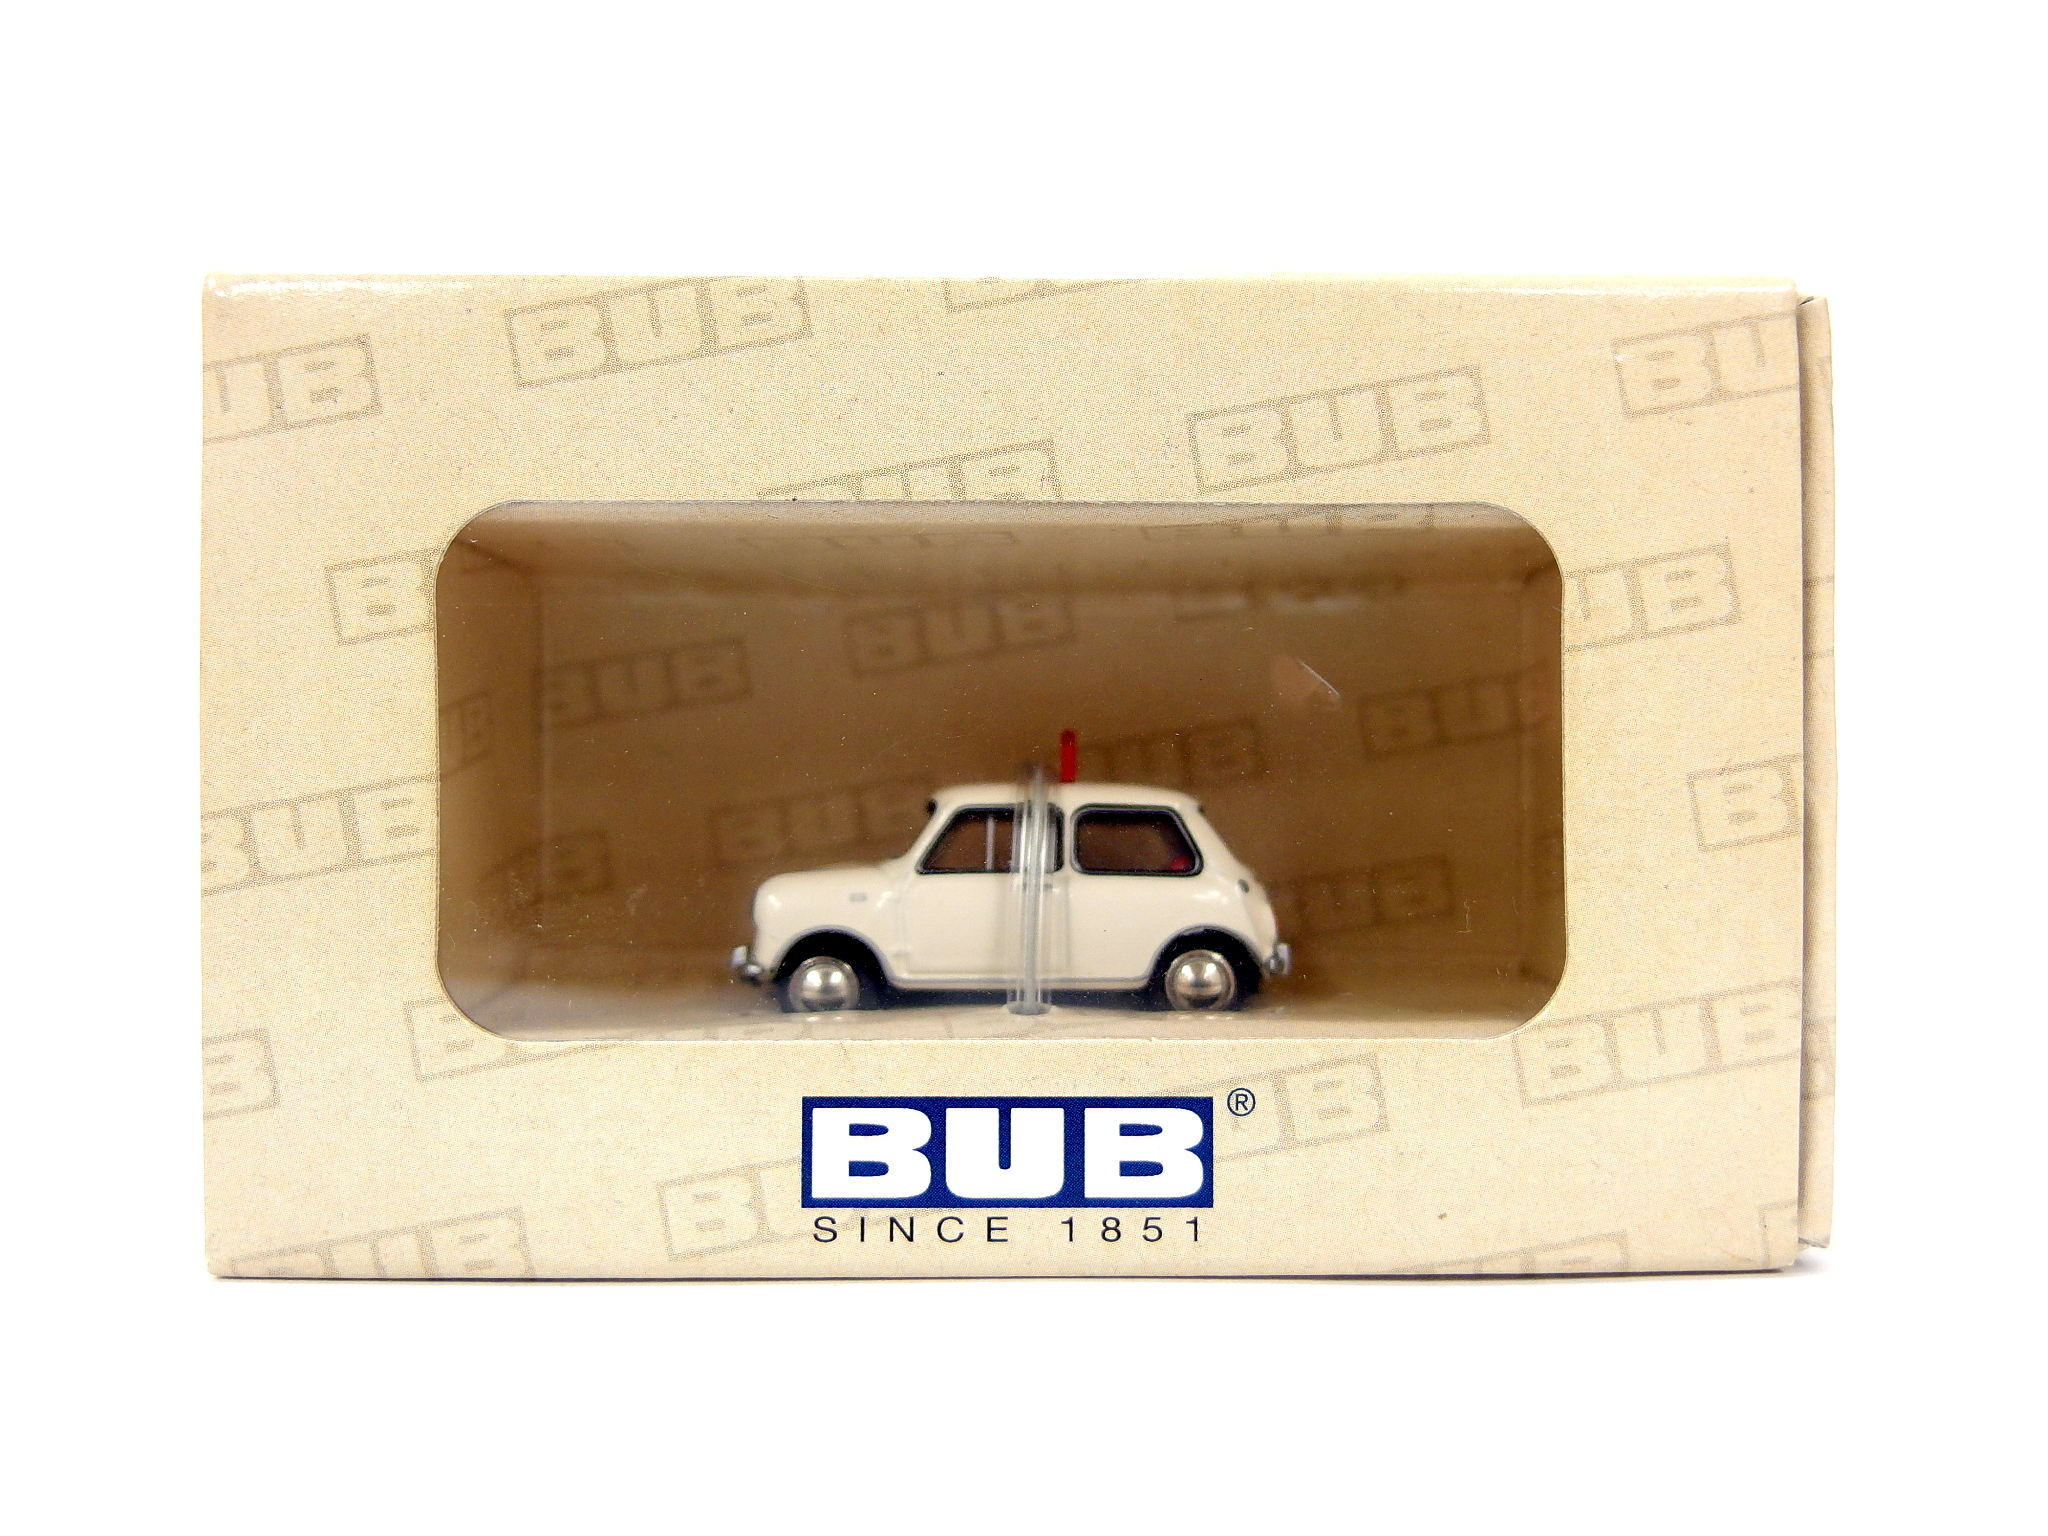 BUB TOY 1/87 Bub Mobile ミニクーパーS 復刻版 2点